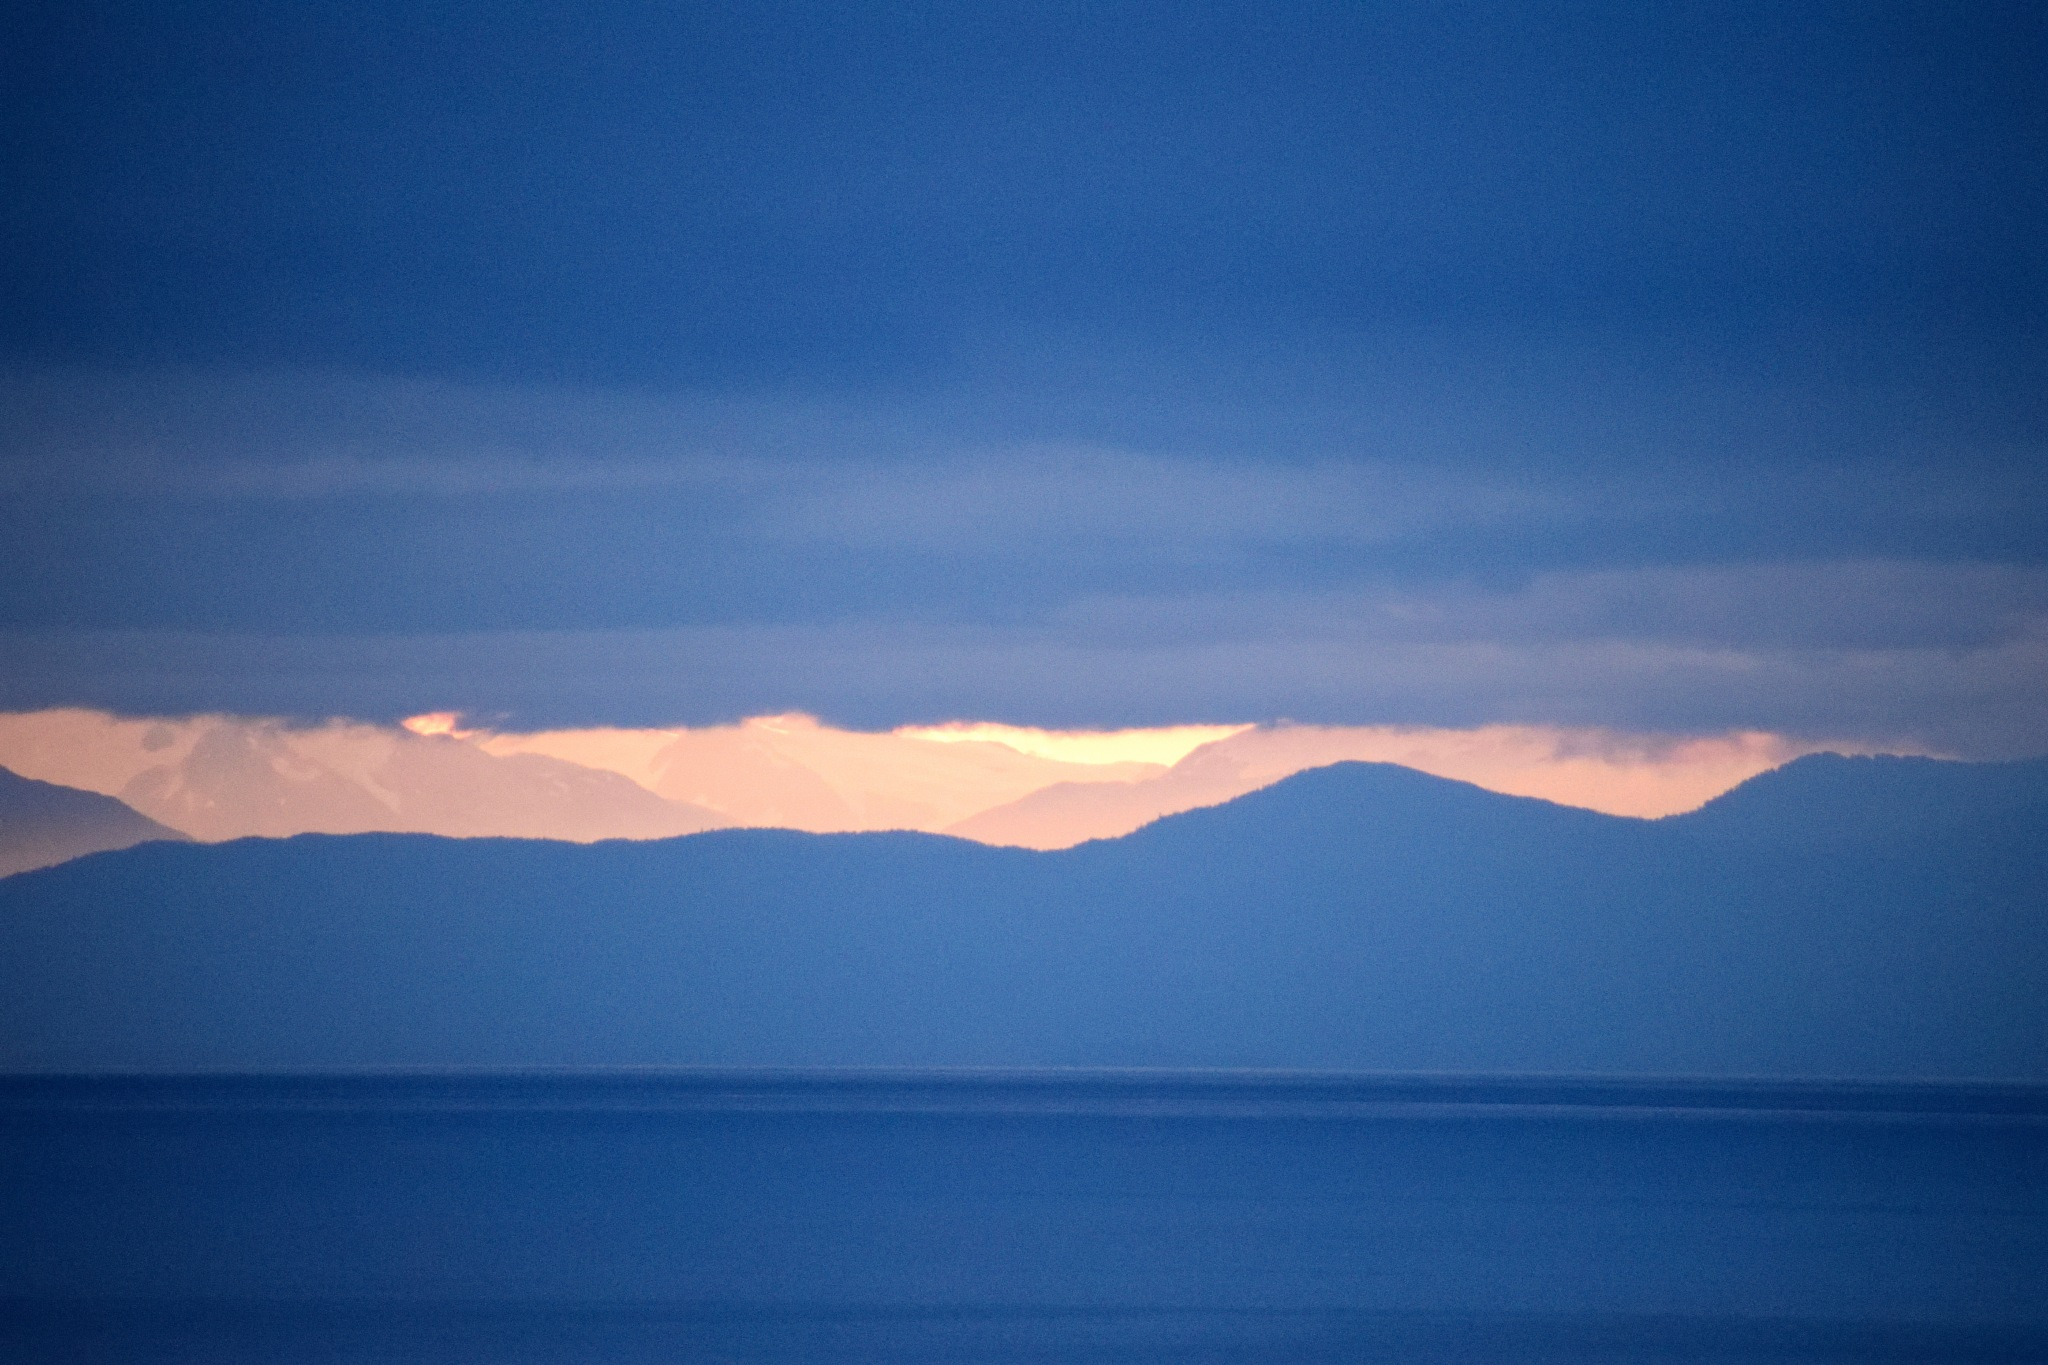 Coastal Clouds by jimcoliton